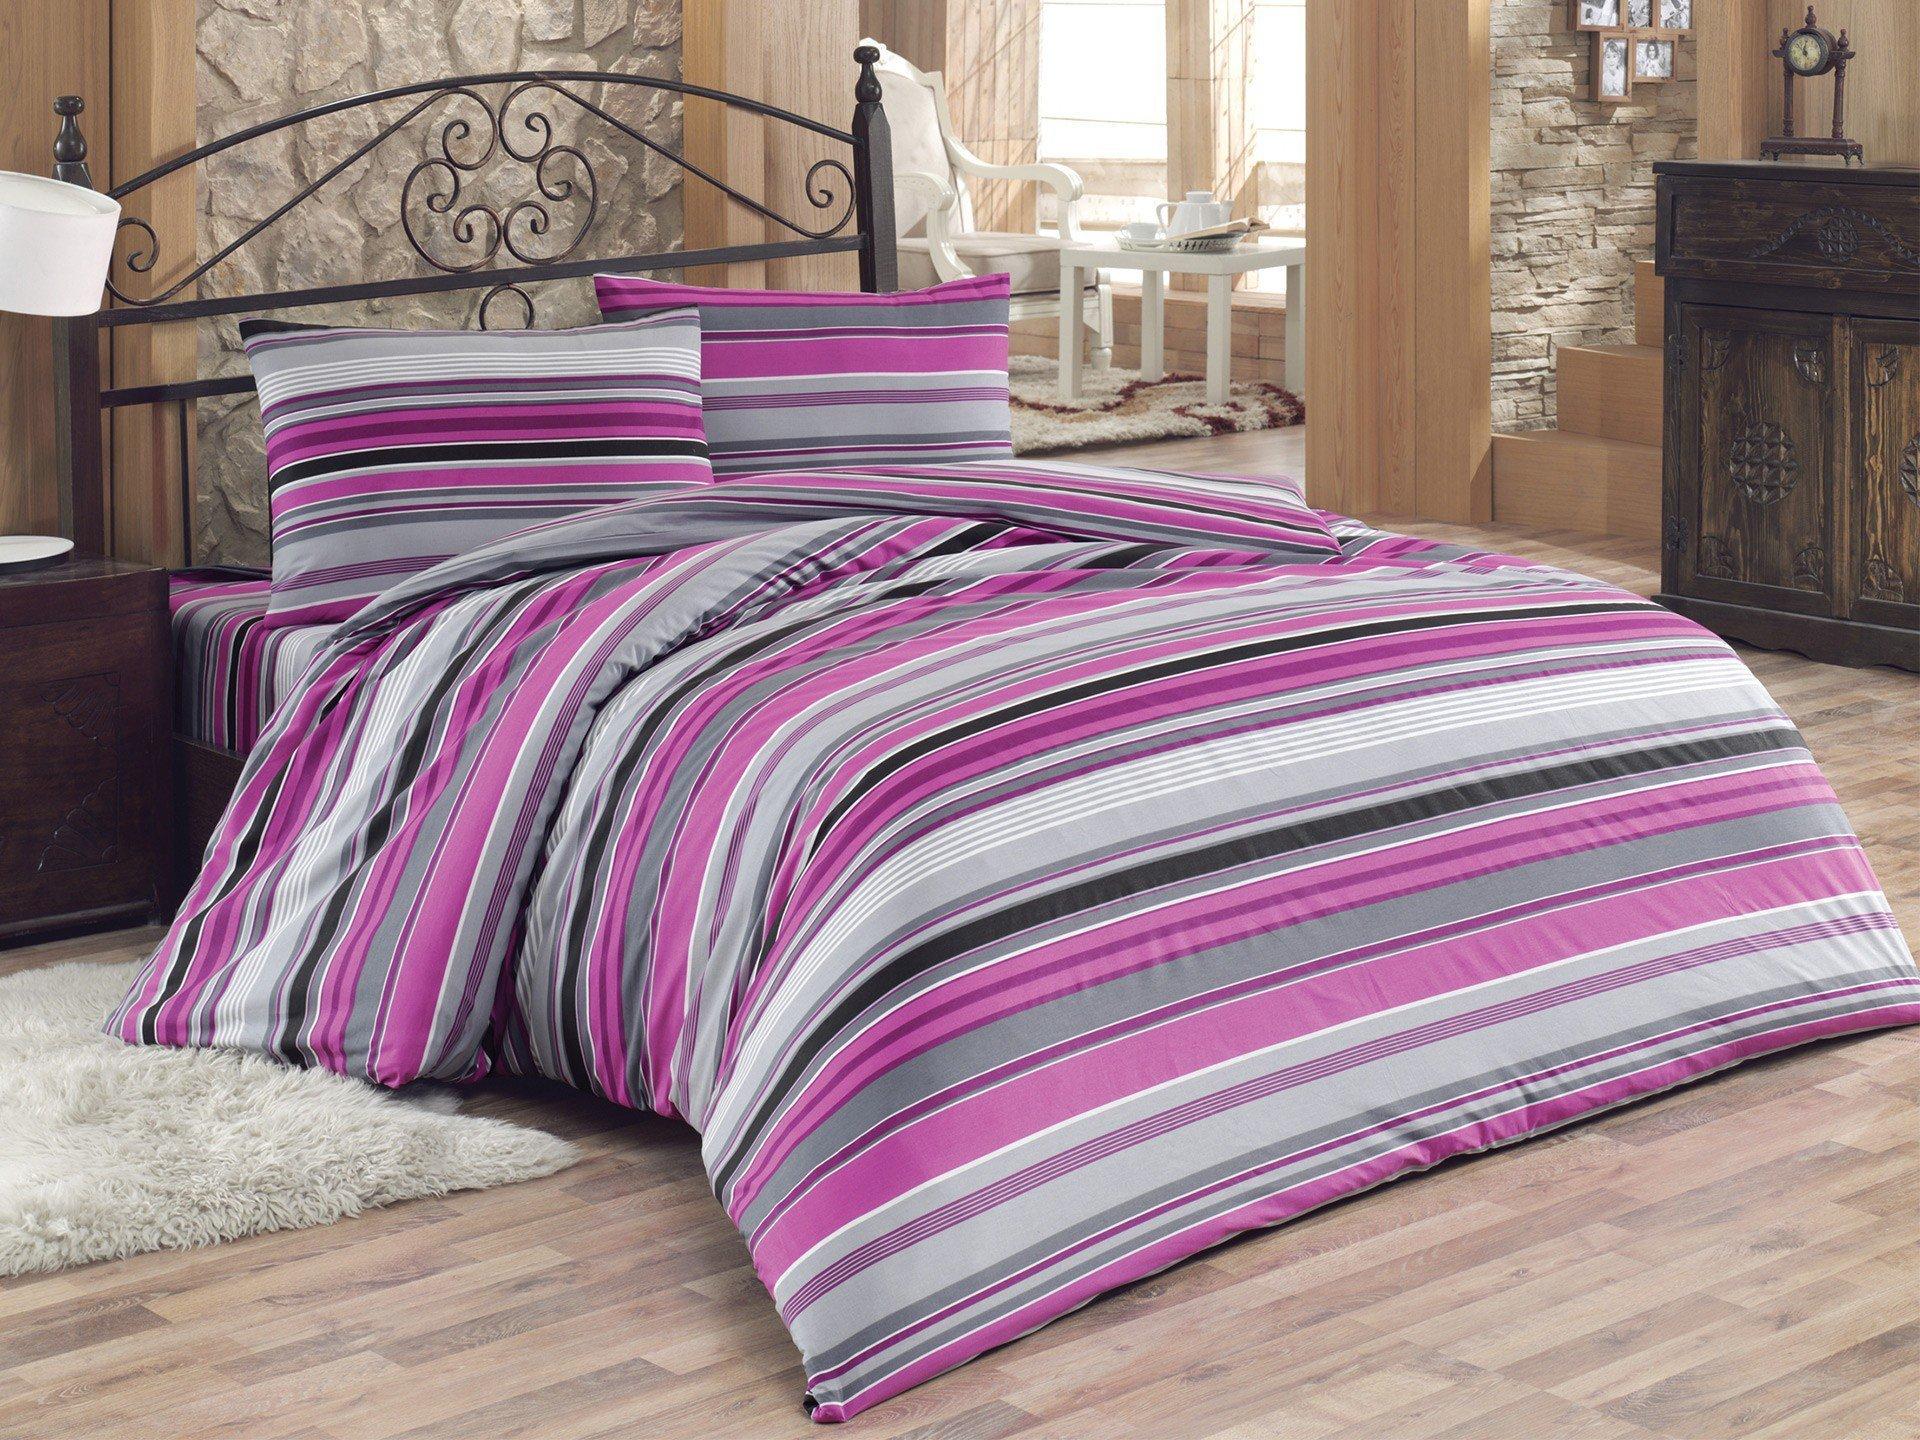 lenjerie pat românească